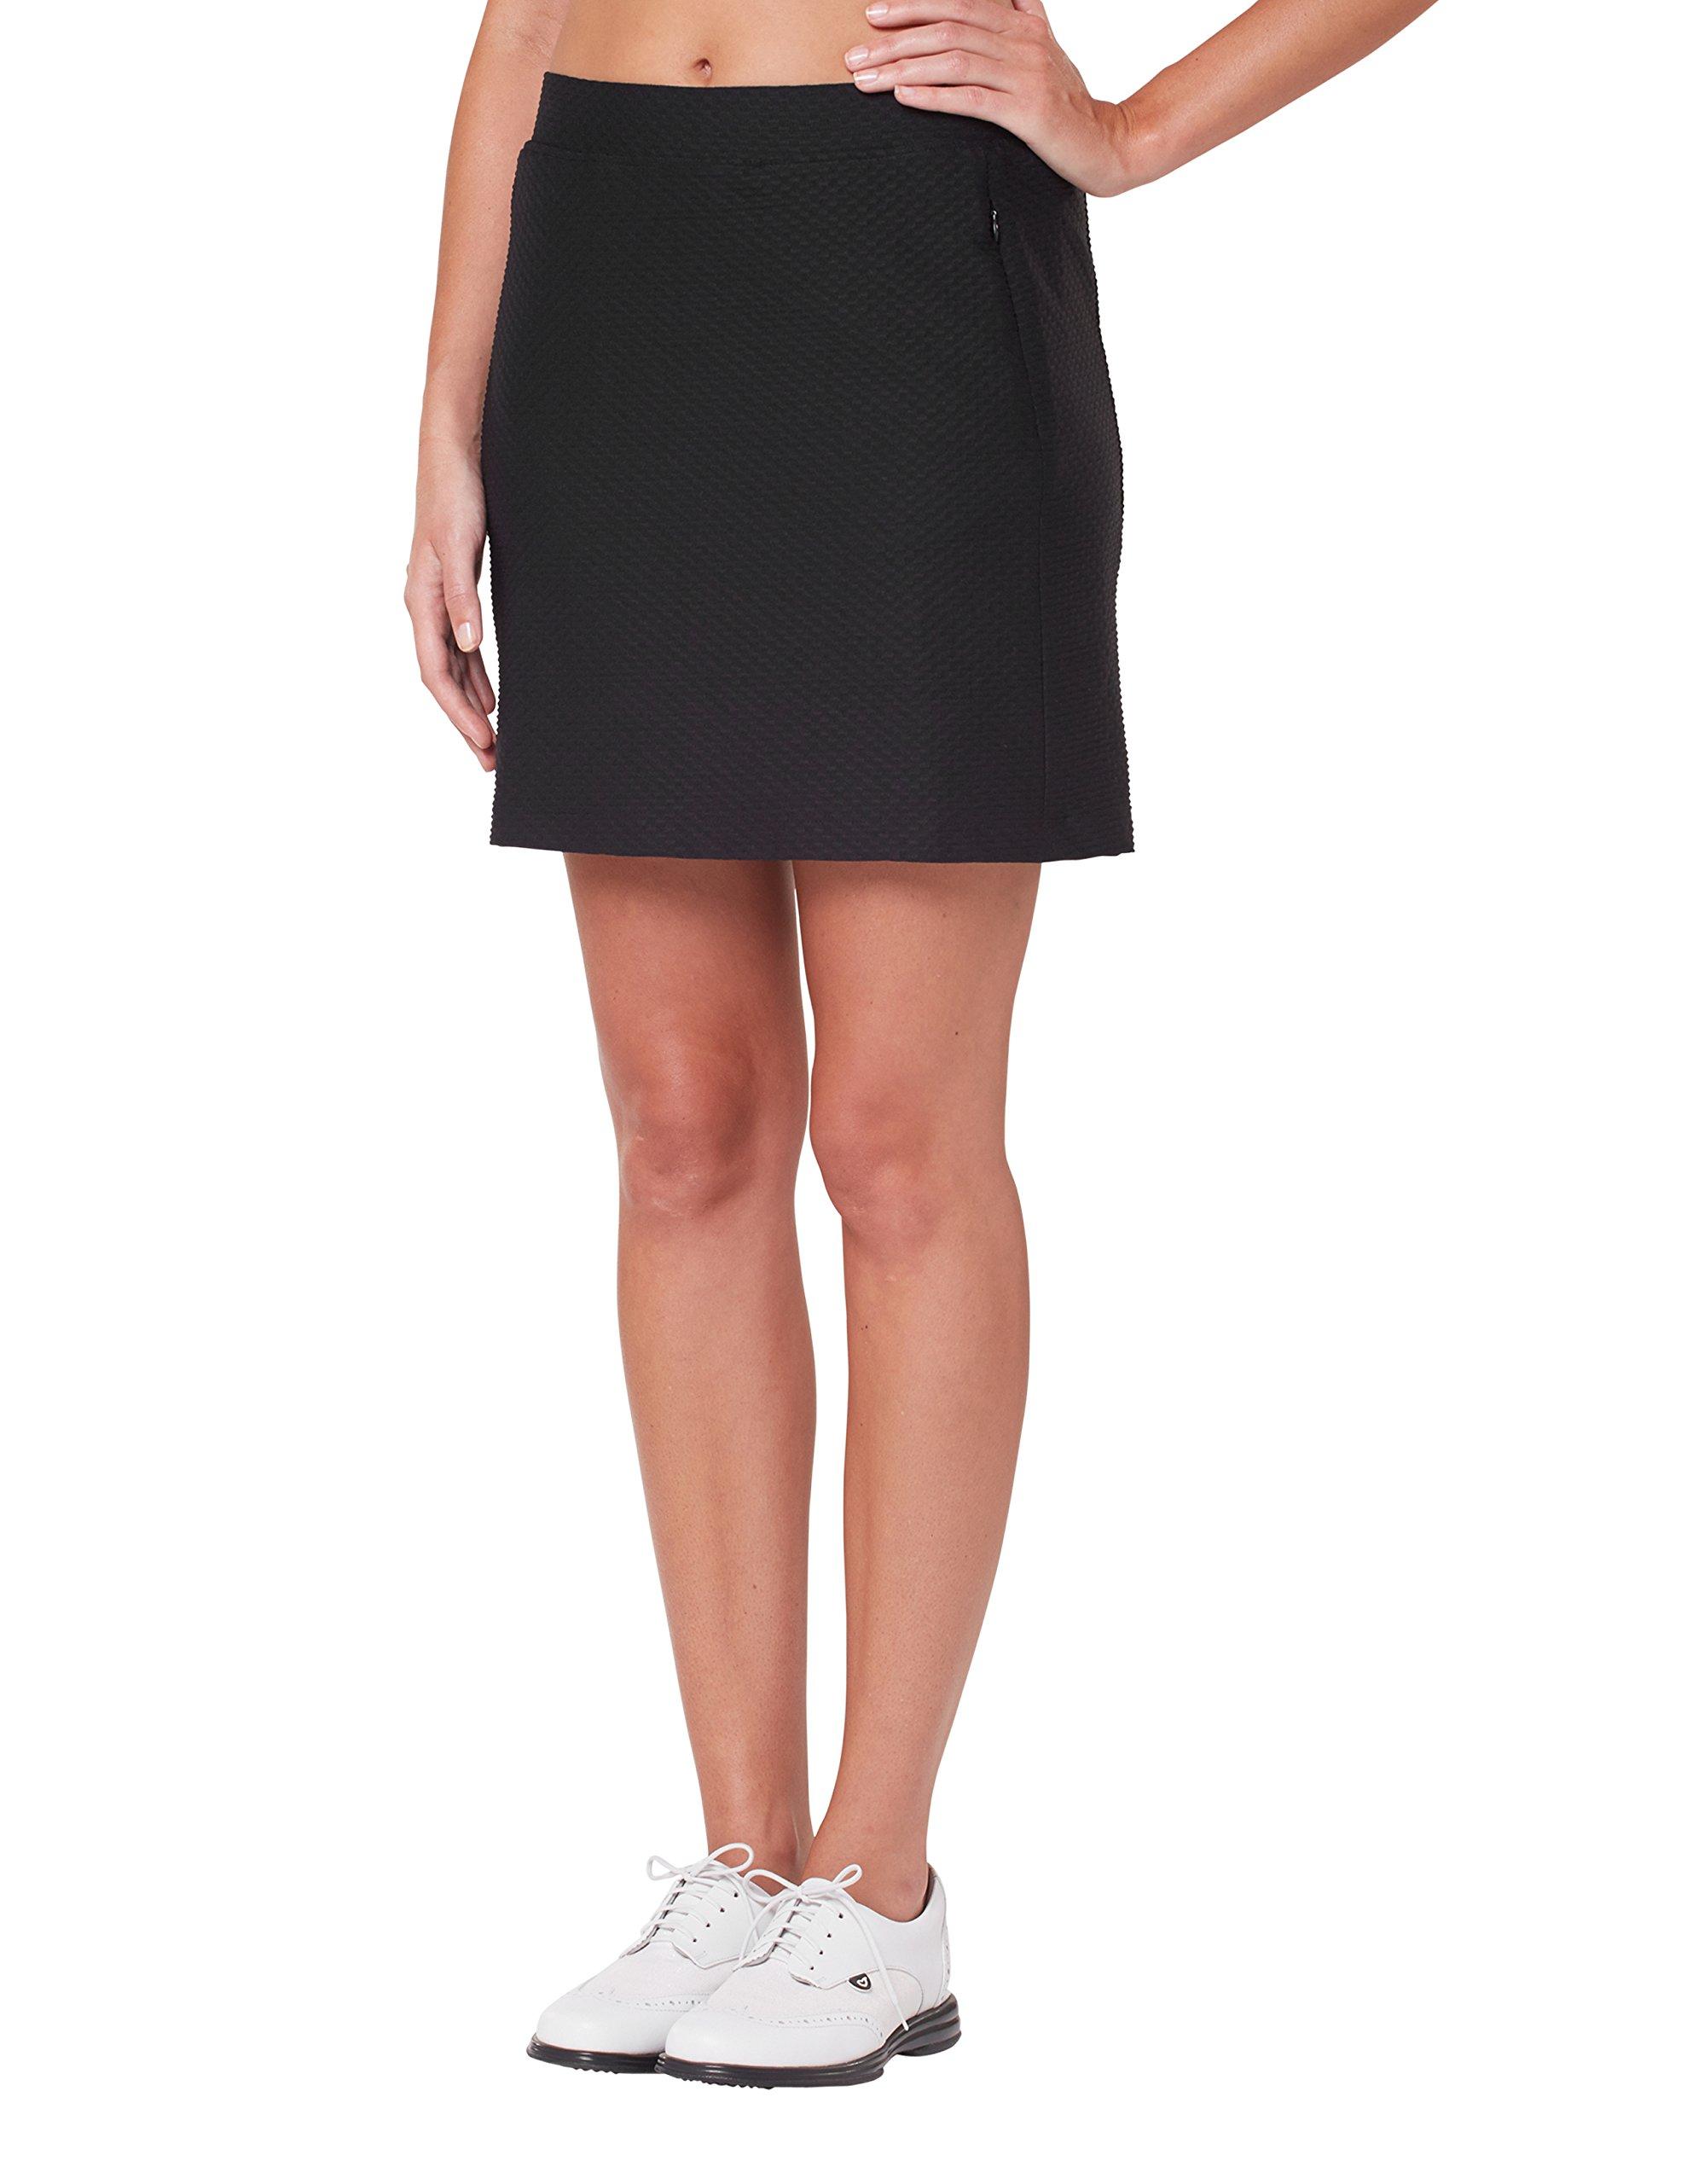 Tail Activewear Women's Elevation Knit Skort Large Black